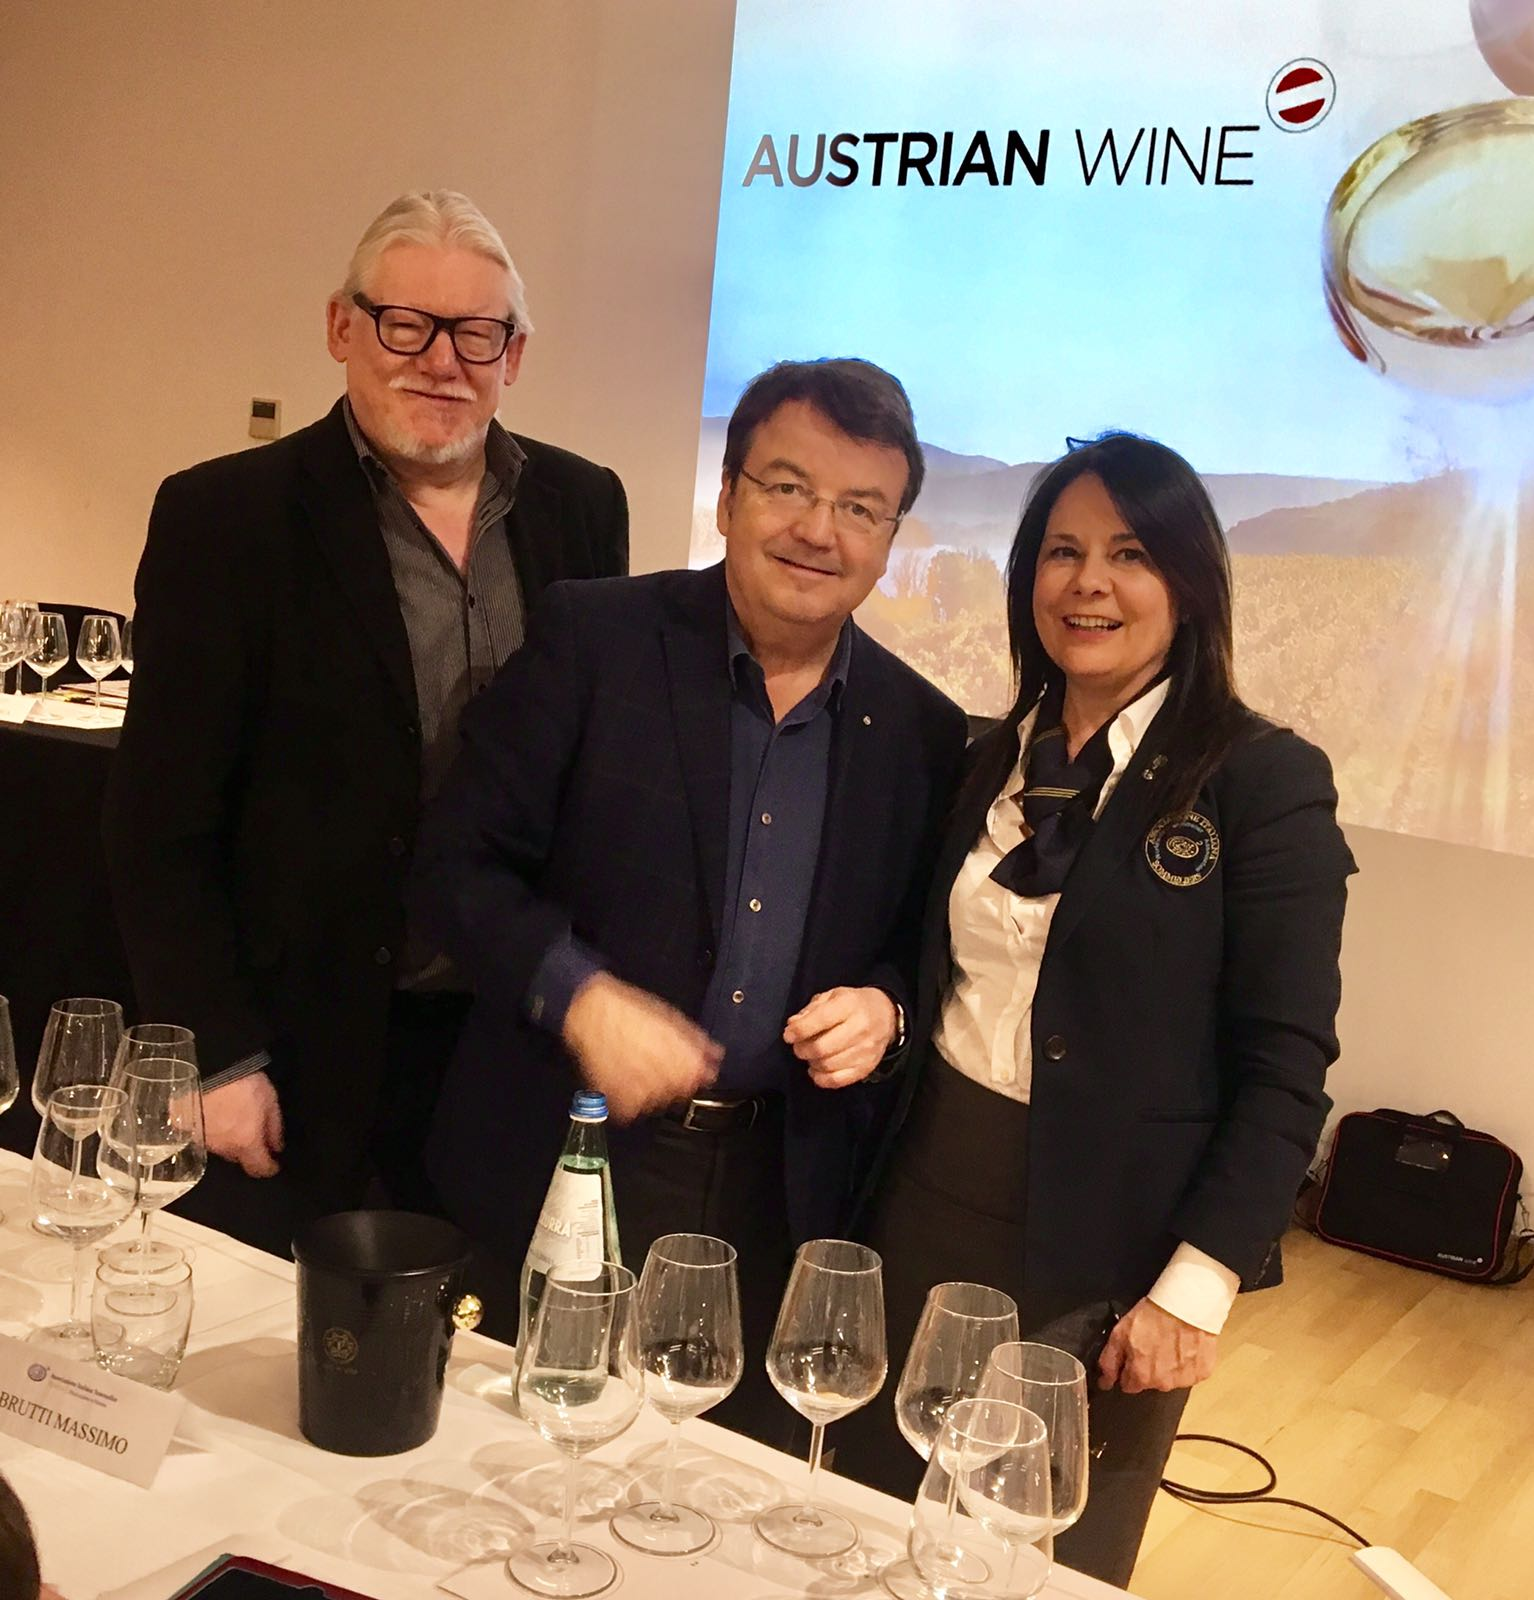 Da sinistra, Helmut Knall, Willi Klinger, Franca Bertani